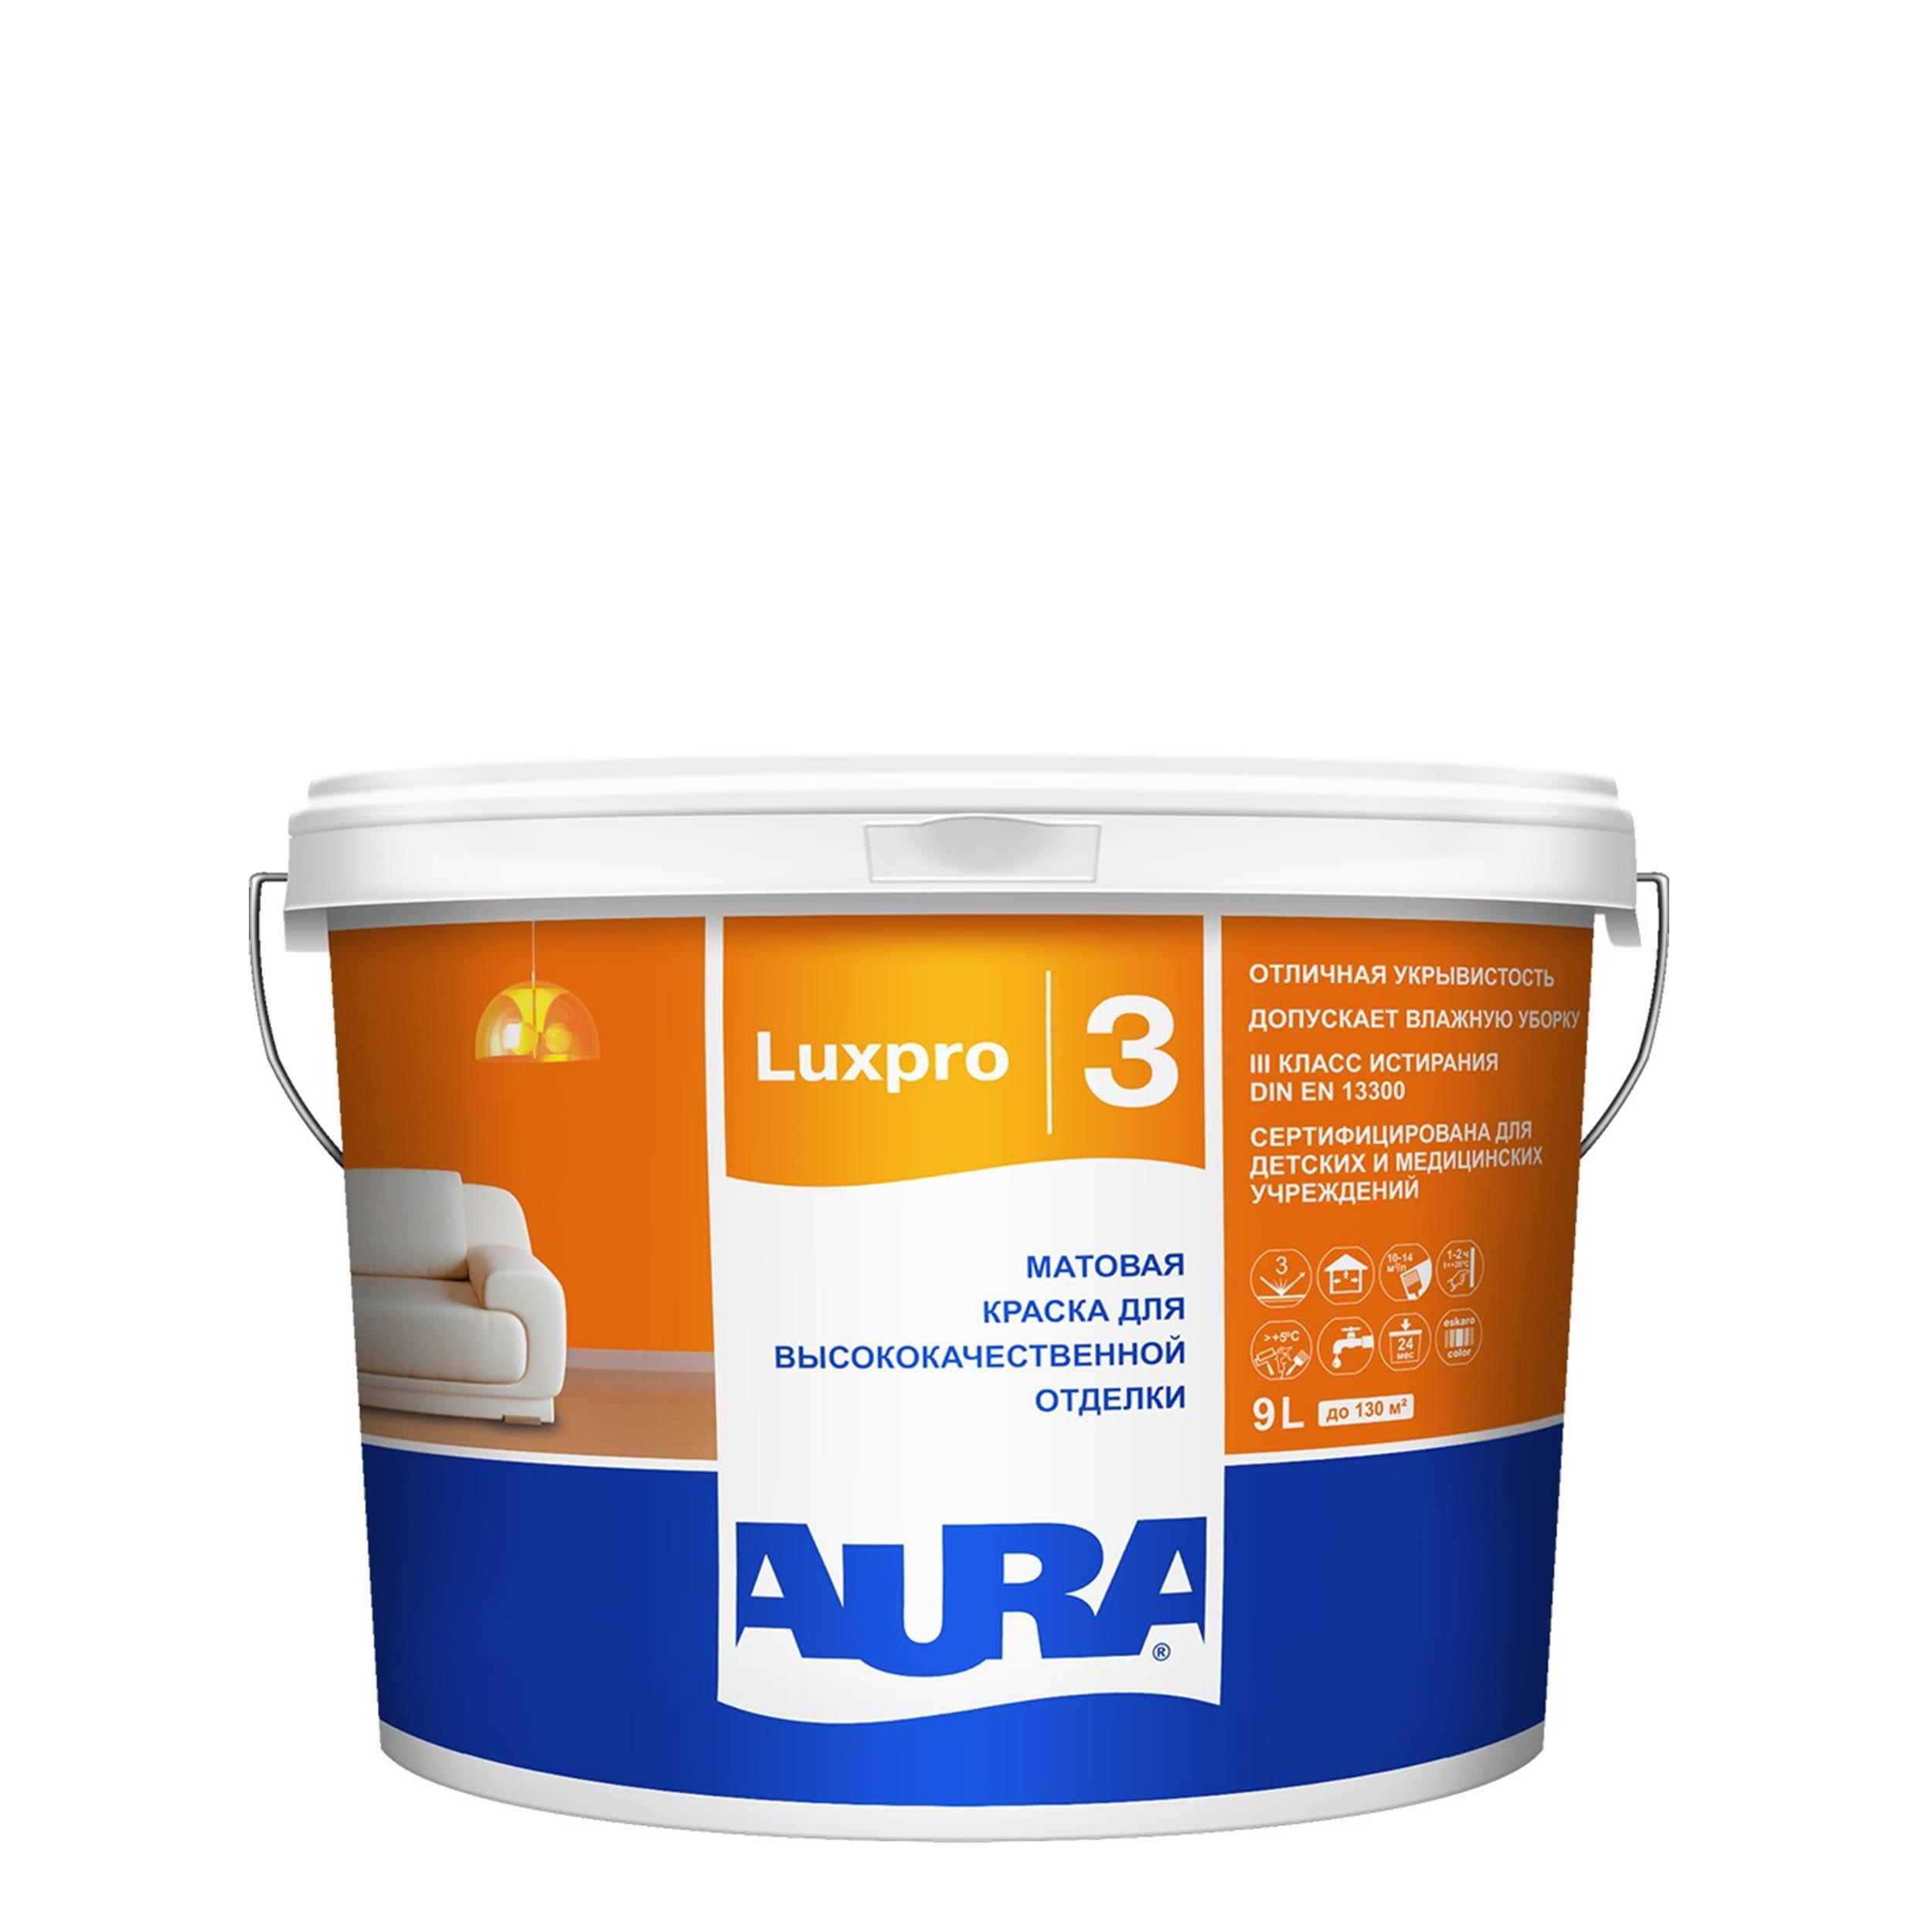 Фото 3 - Краска интерьерная, Aura LuxPRO 3, RAL 5023, 11 кг.